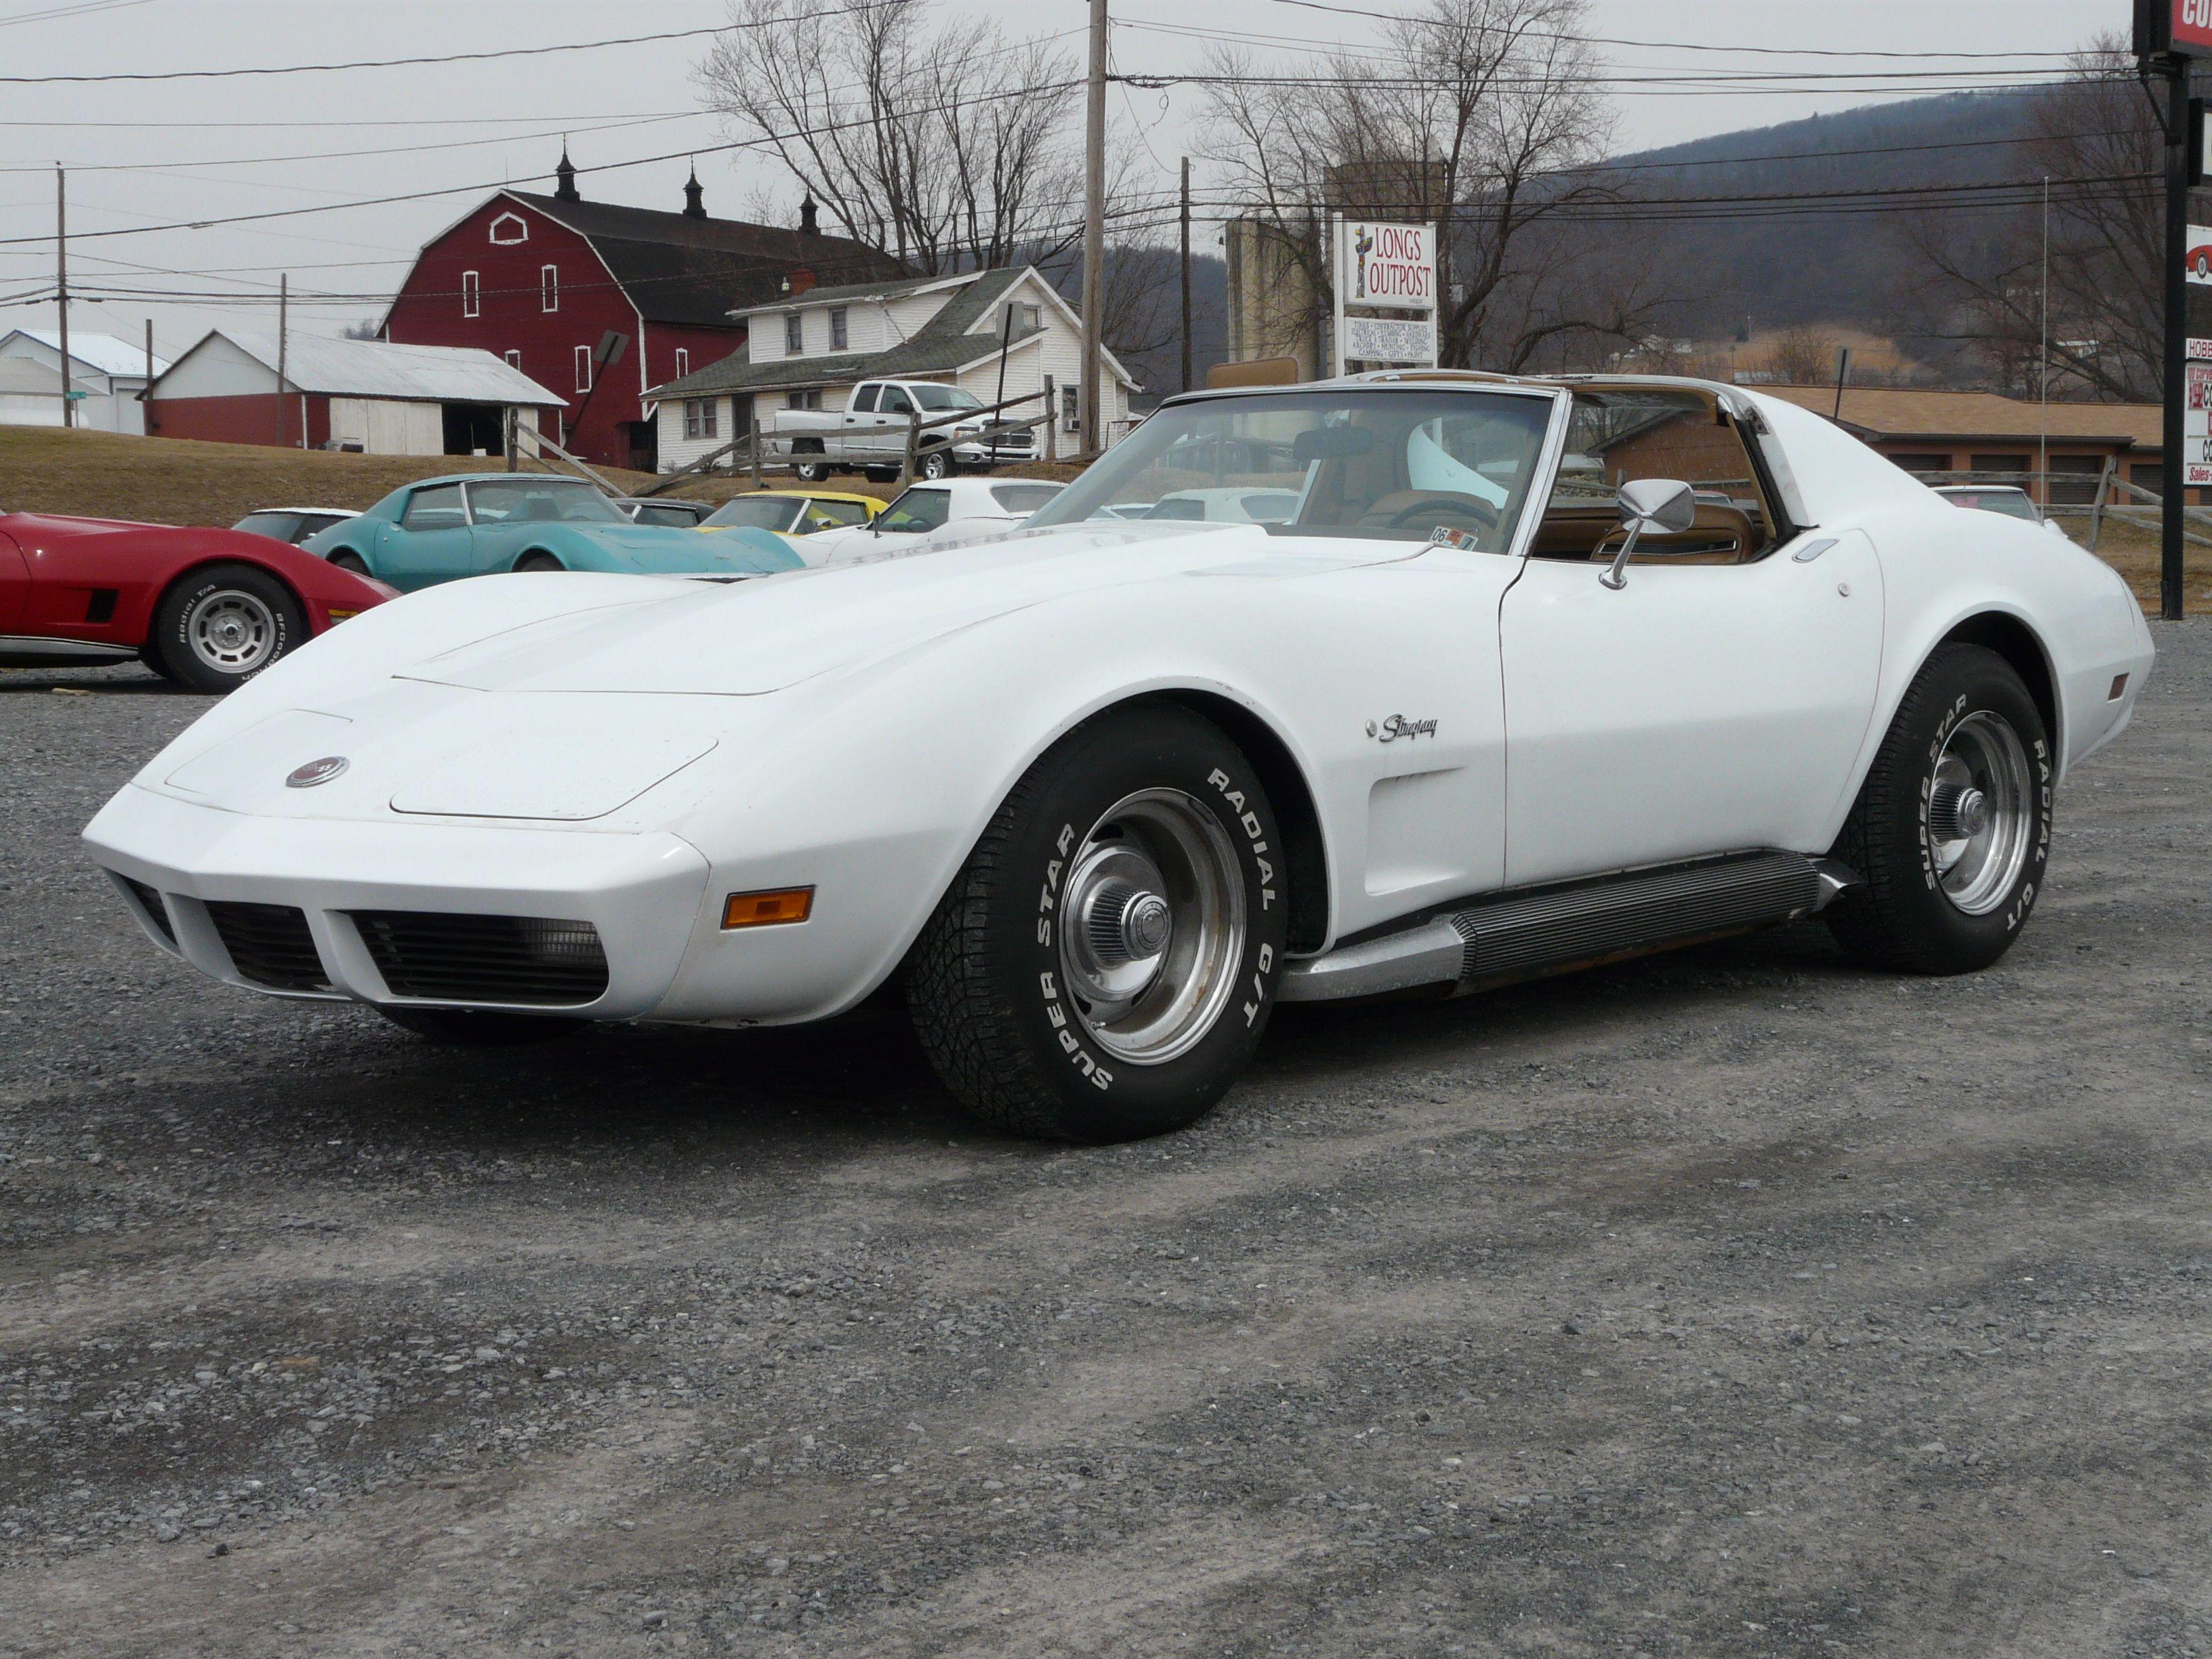 1974 White Corvette Stingray T Top 4spd Check out this vette 1973